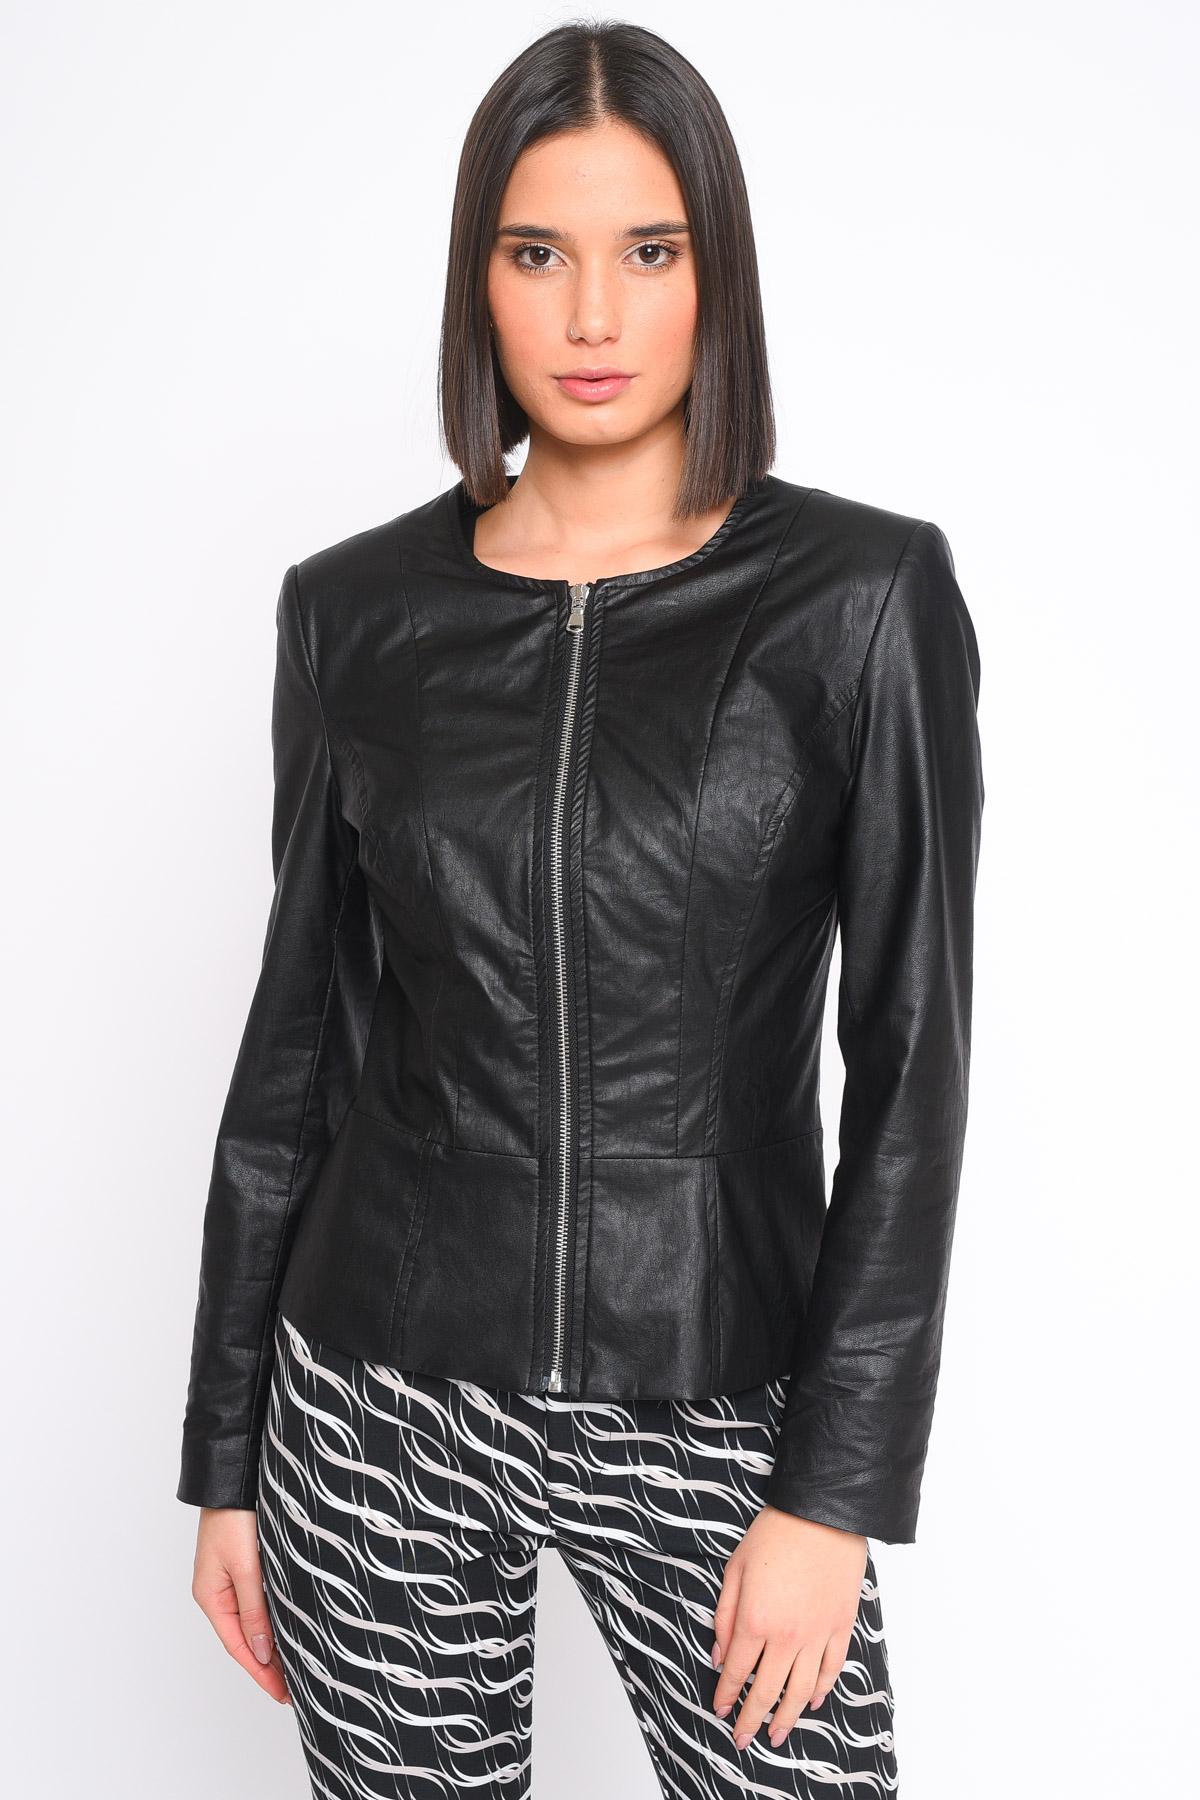 GIACCA IN ECOPELLE A COREANA for women -  - Paquito Pronto Moda Shop Online